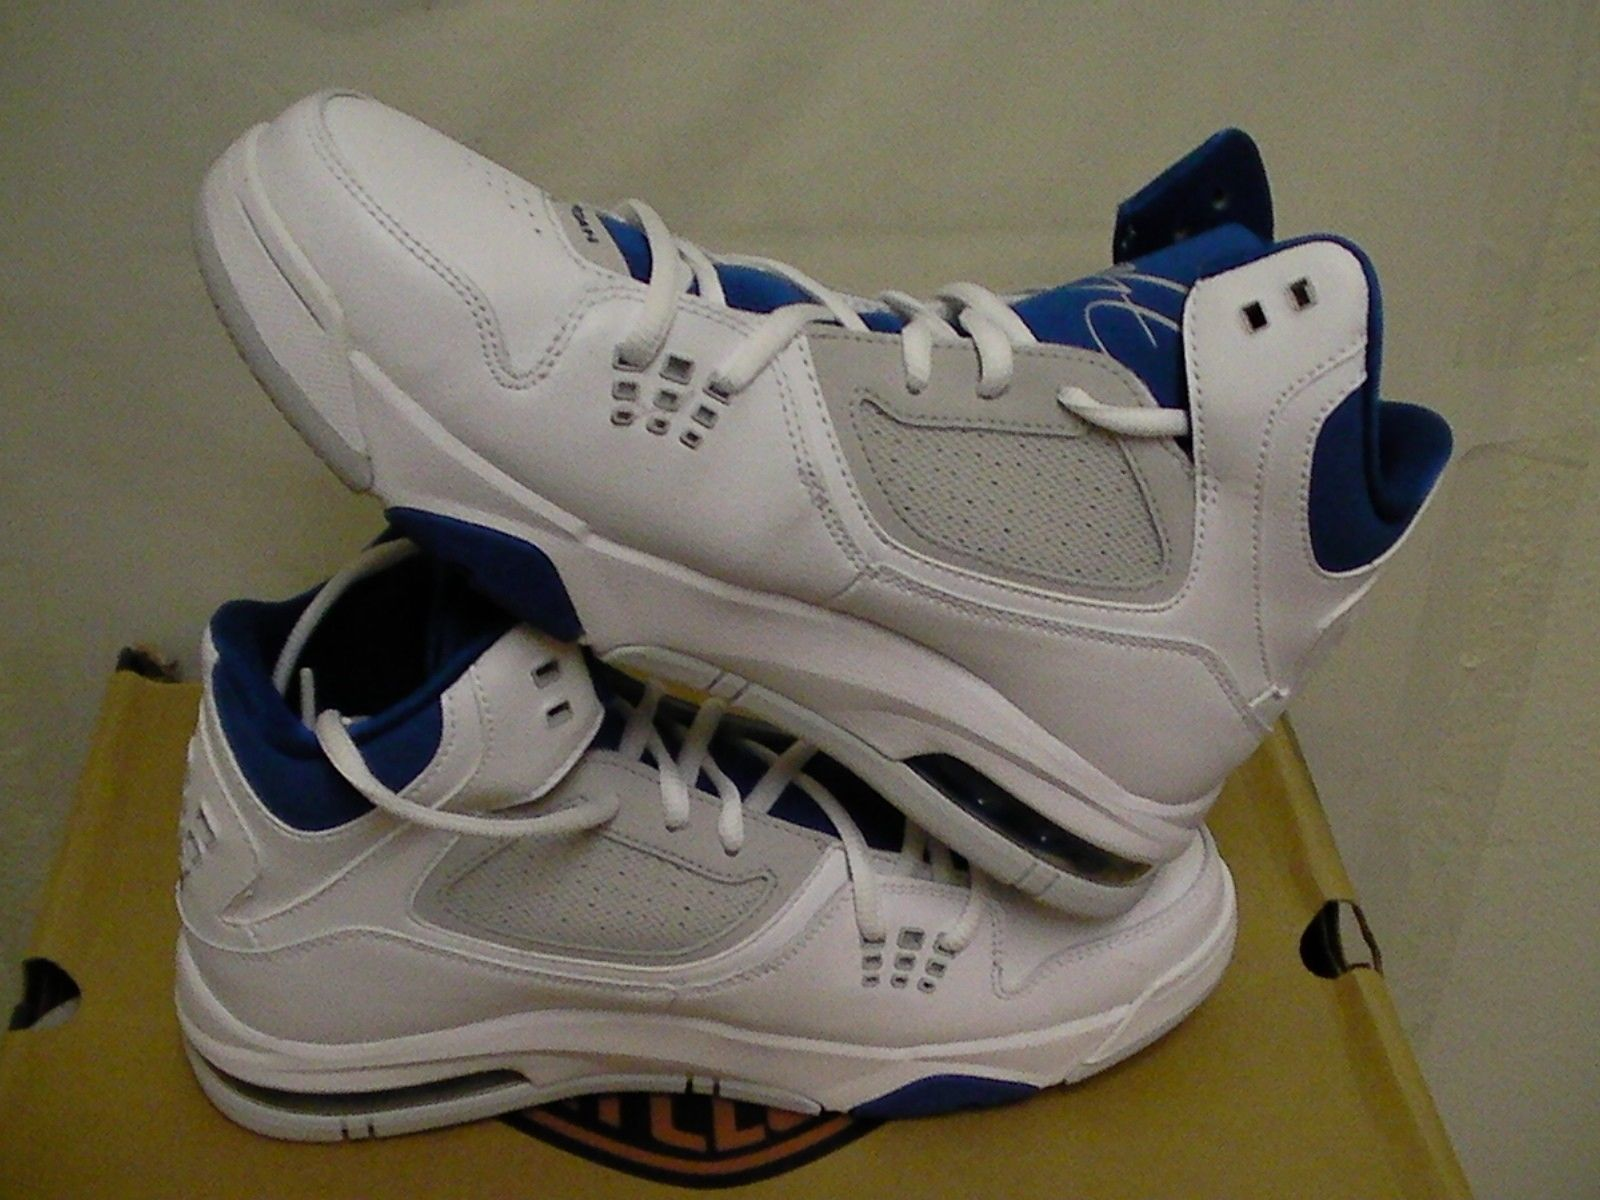 newest 2eaf5 72ecd Jordan flight 23 (GS) basketball shoes size 6.5 Youth new